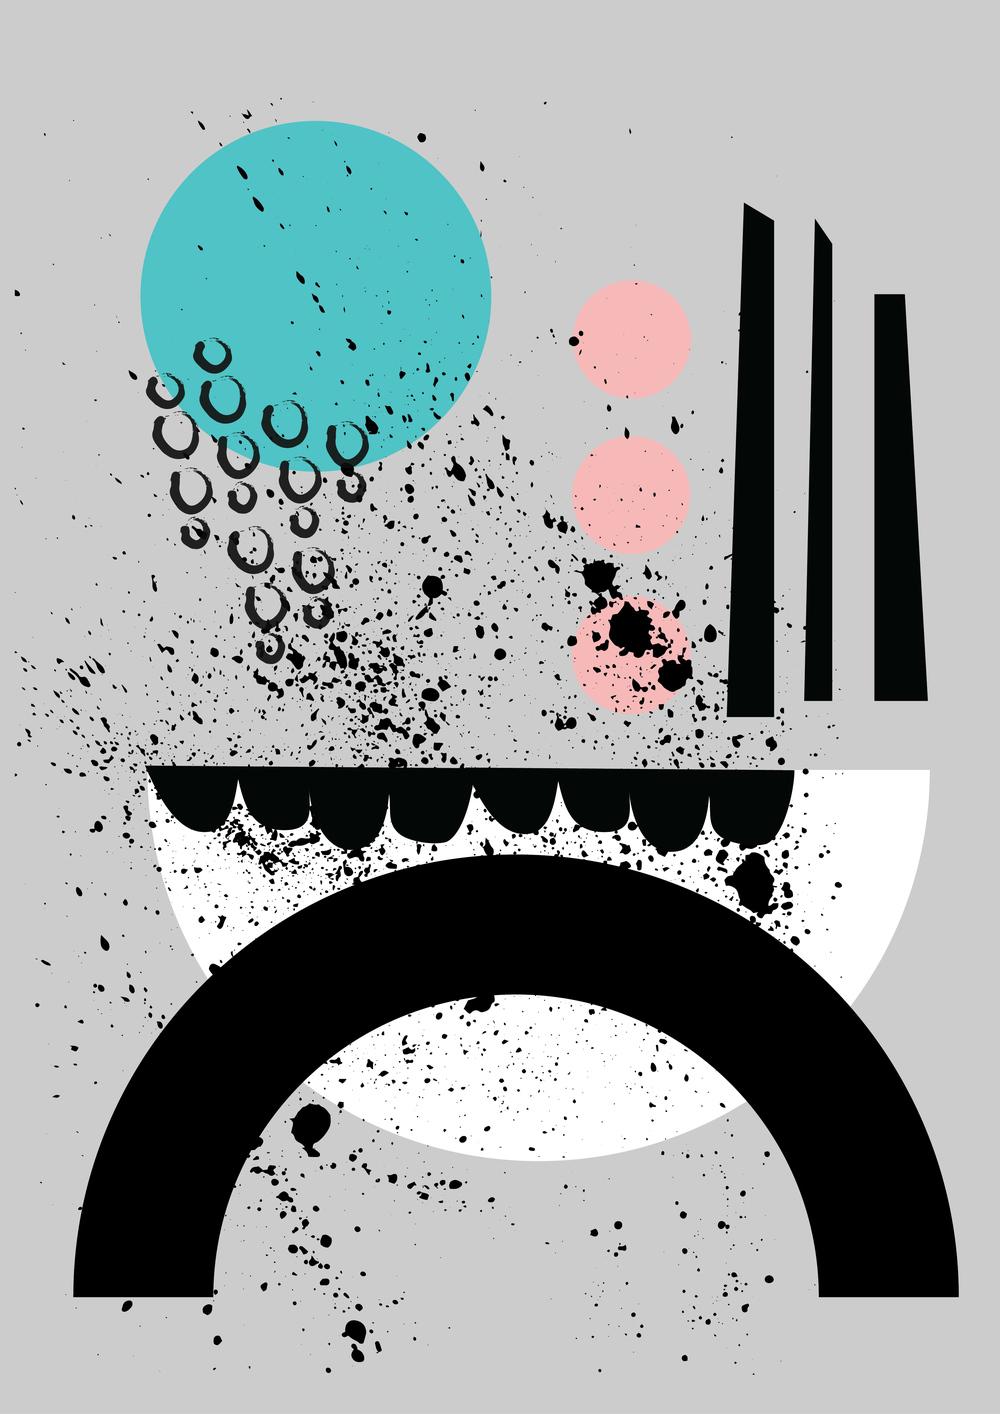 greypinkturquoise print-01.jpg